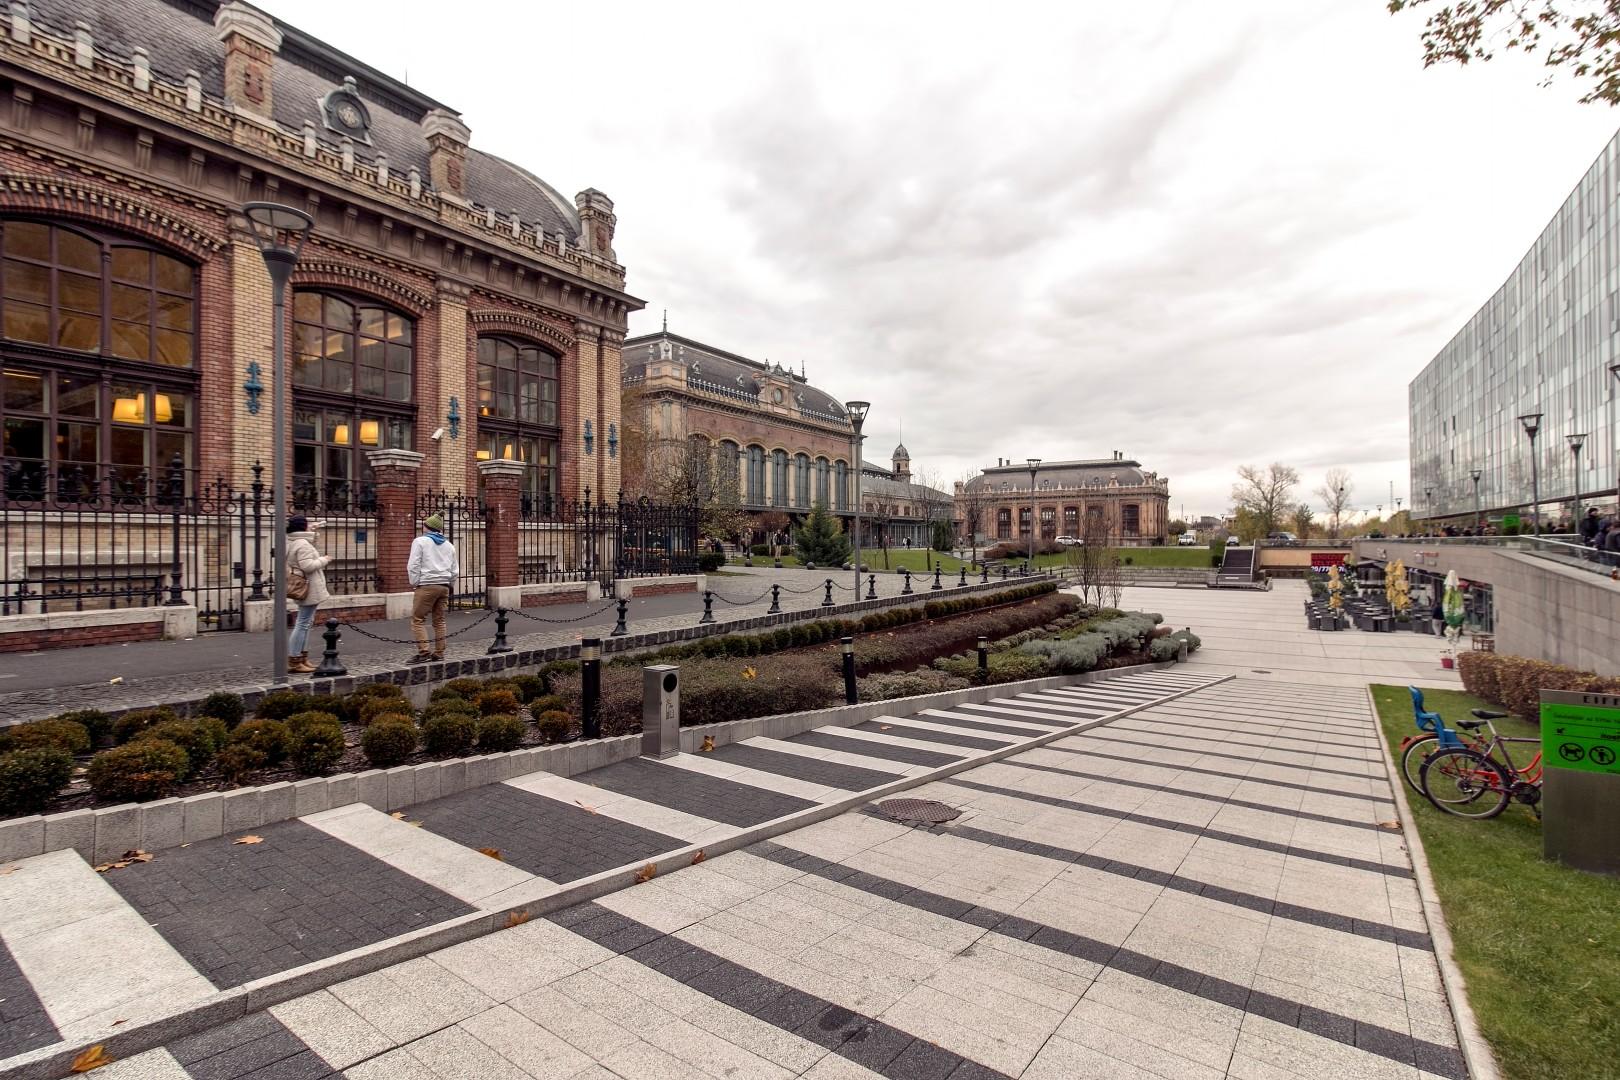 Nyugati square